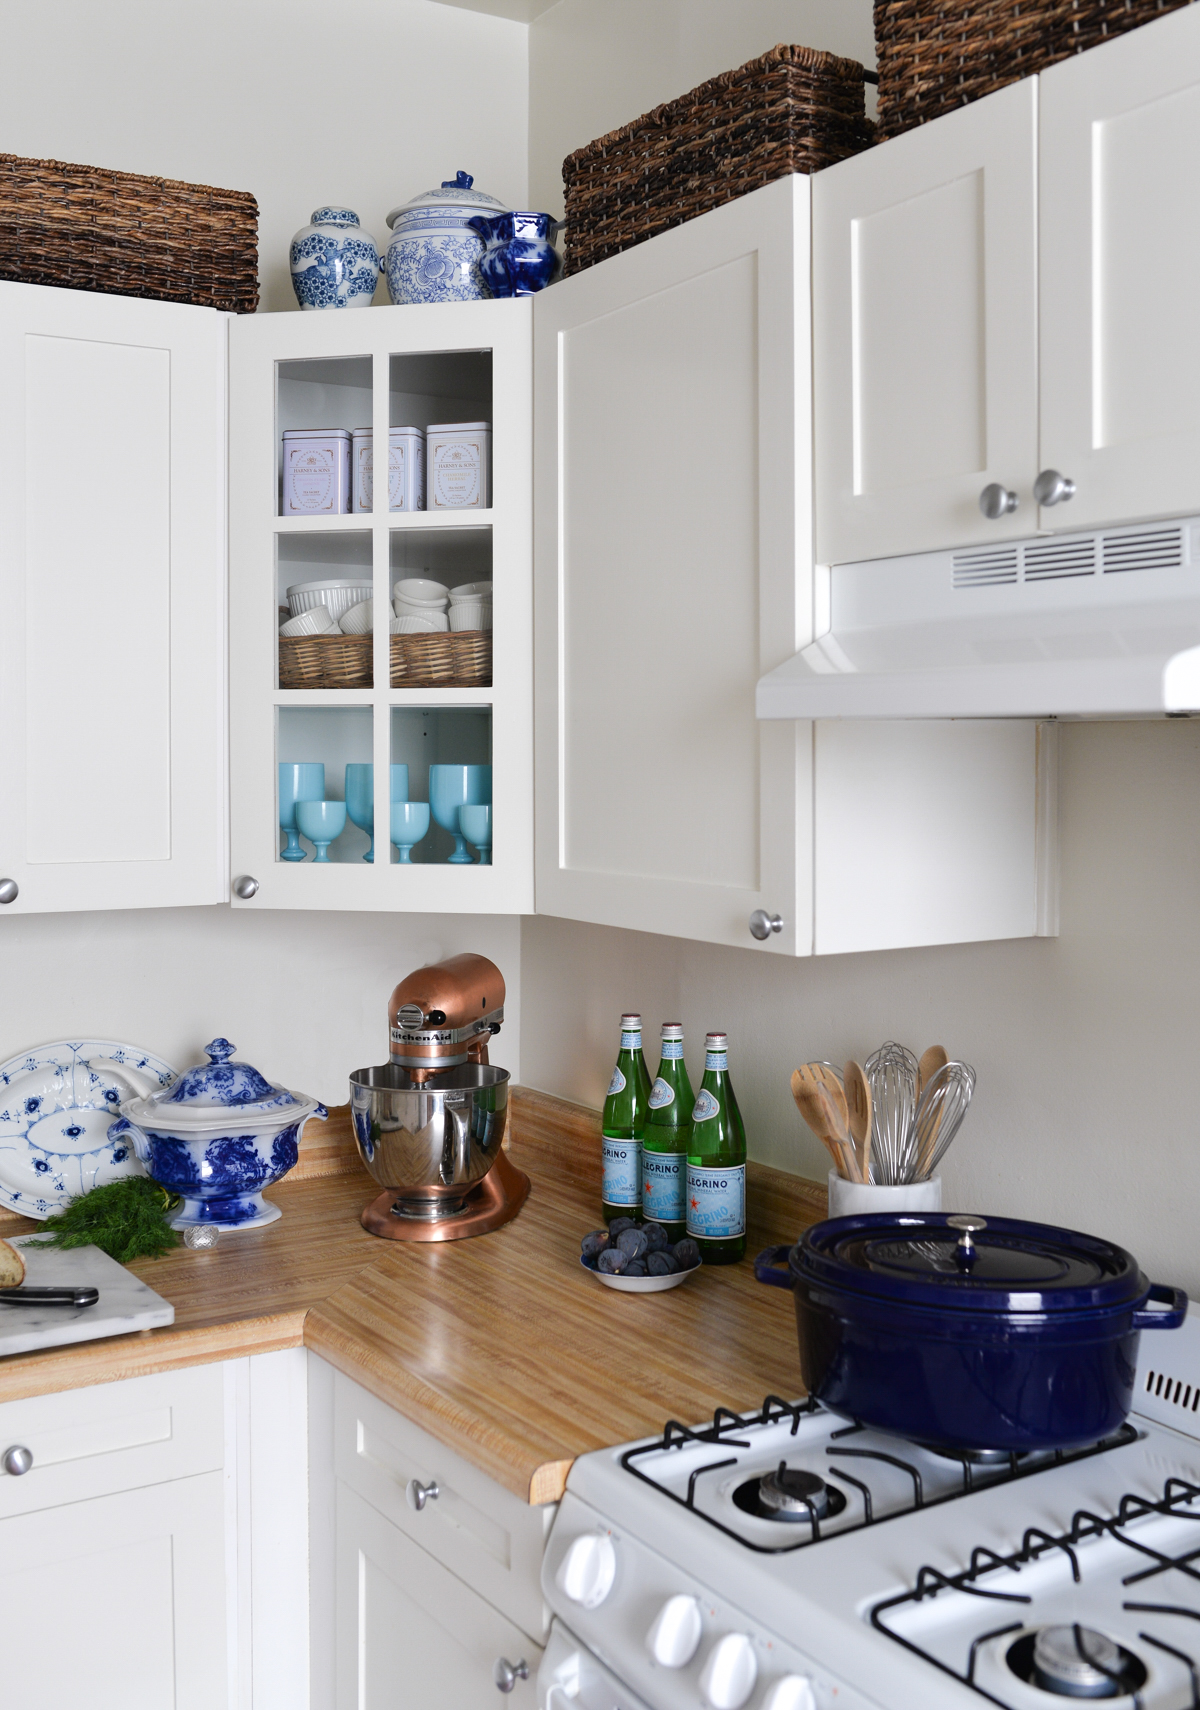 Small space kitchen ideas